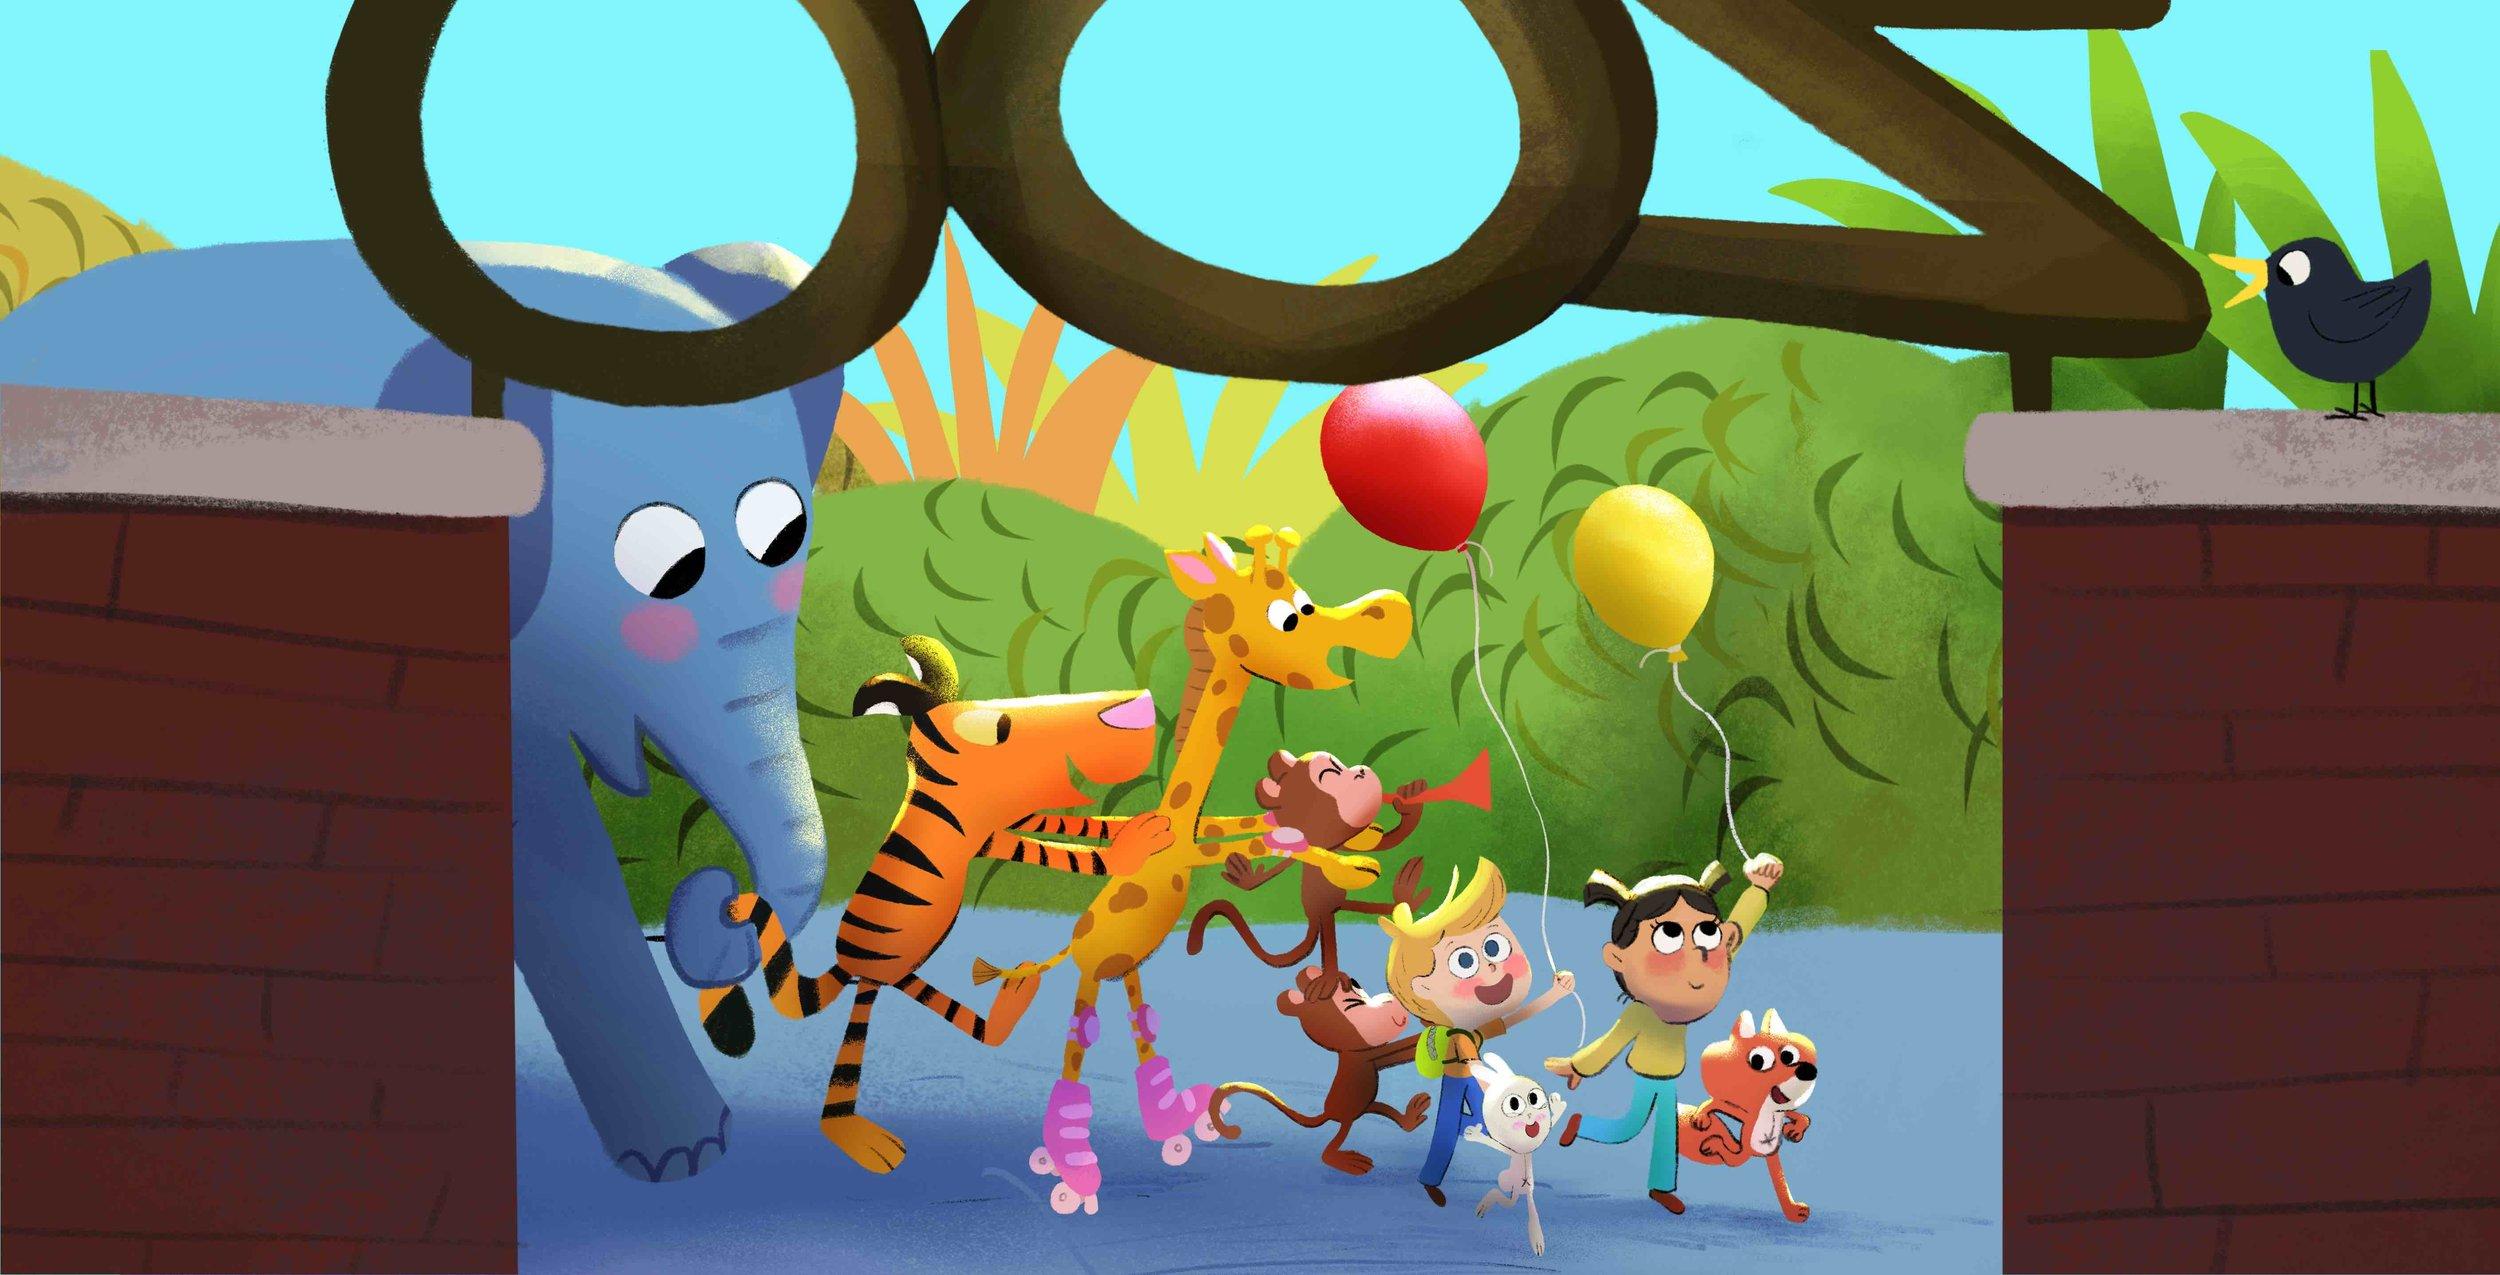 Zoo_Promo_3.jpg